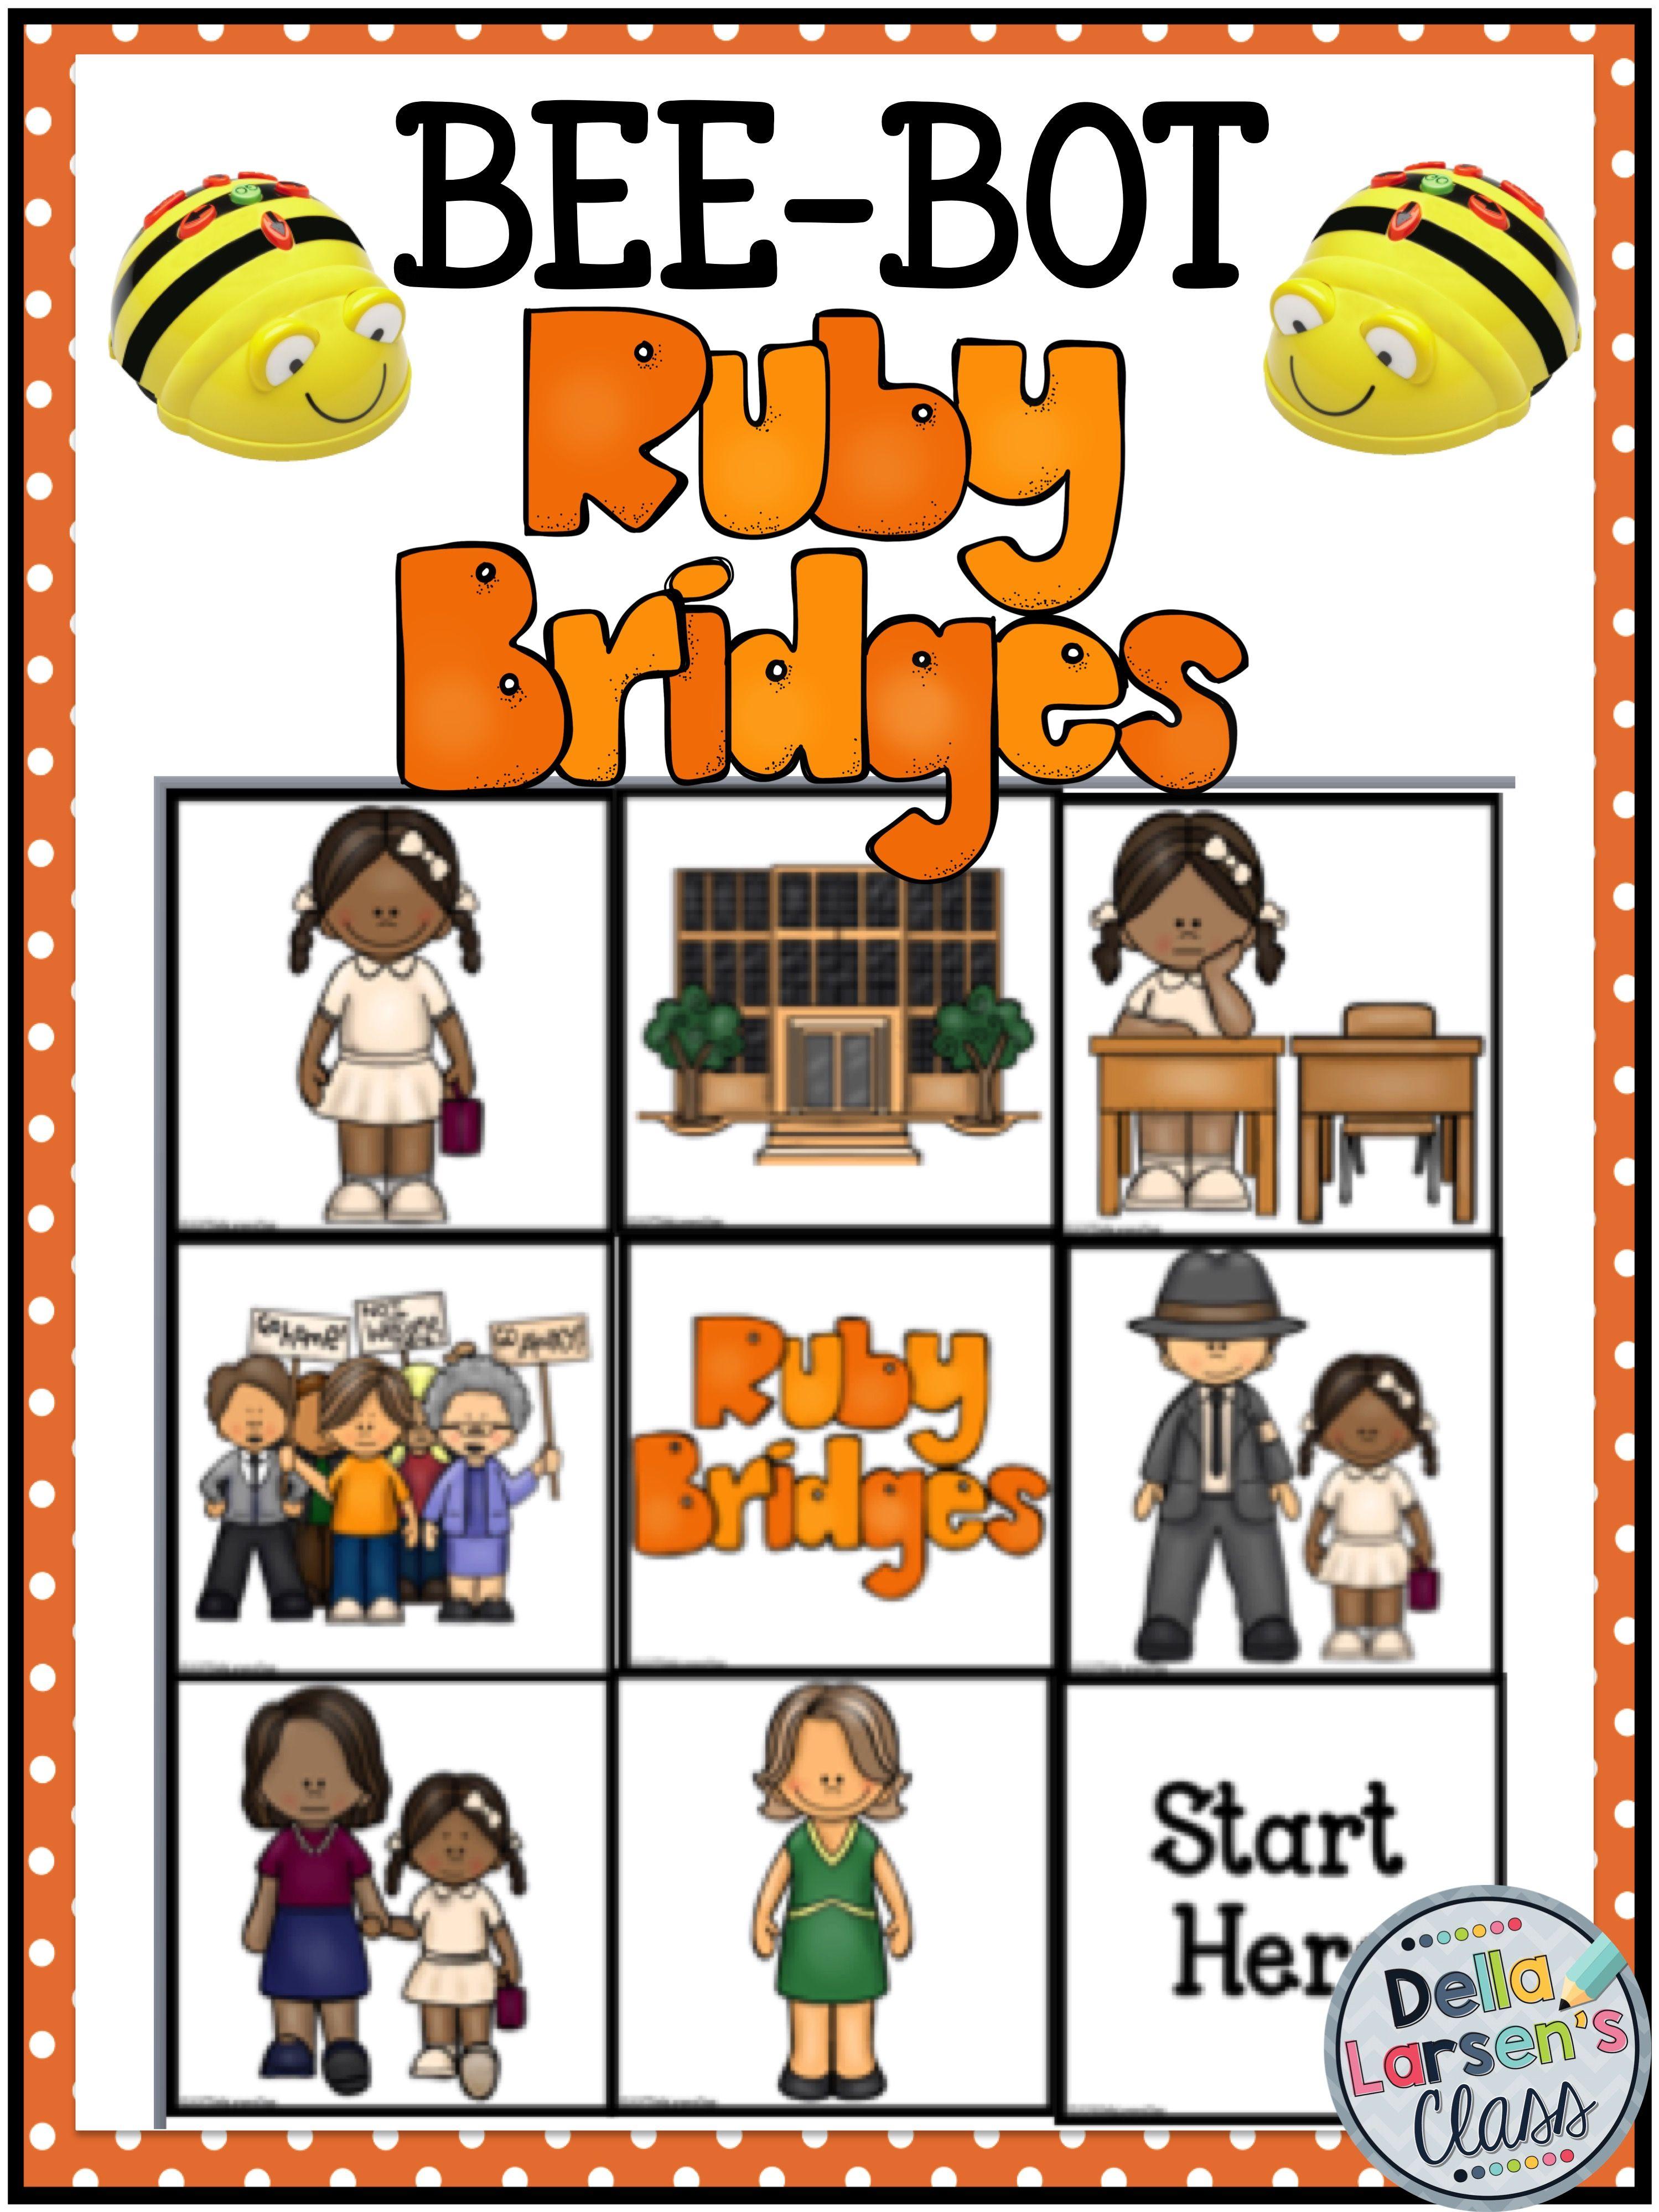 Bee Bot Ruby Bridges In